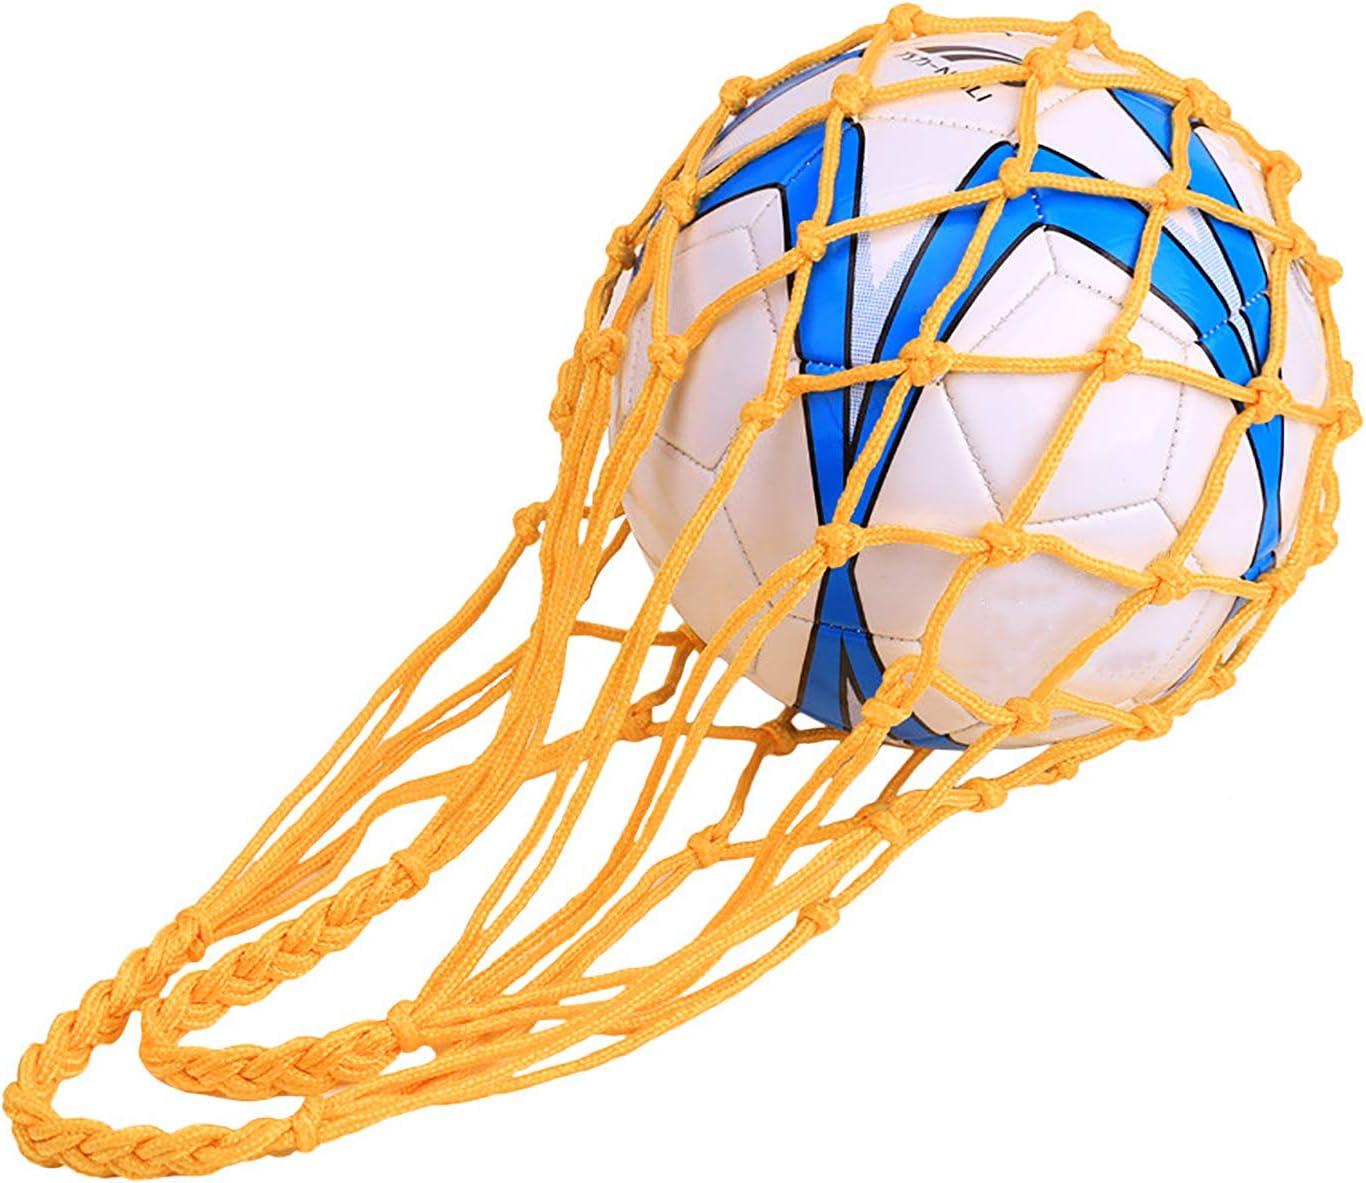 pr/ácticas Bolsa de Transporte para Baloncesto Ligeras Voleibol Verduras y Frutas QCHOMEE 2 Bolsas de Pelotas de Malla para Transportar Pelotas de Nailon